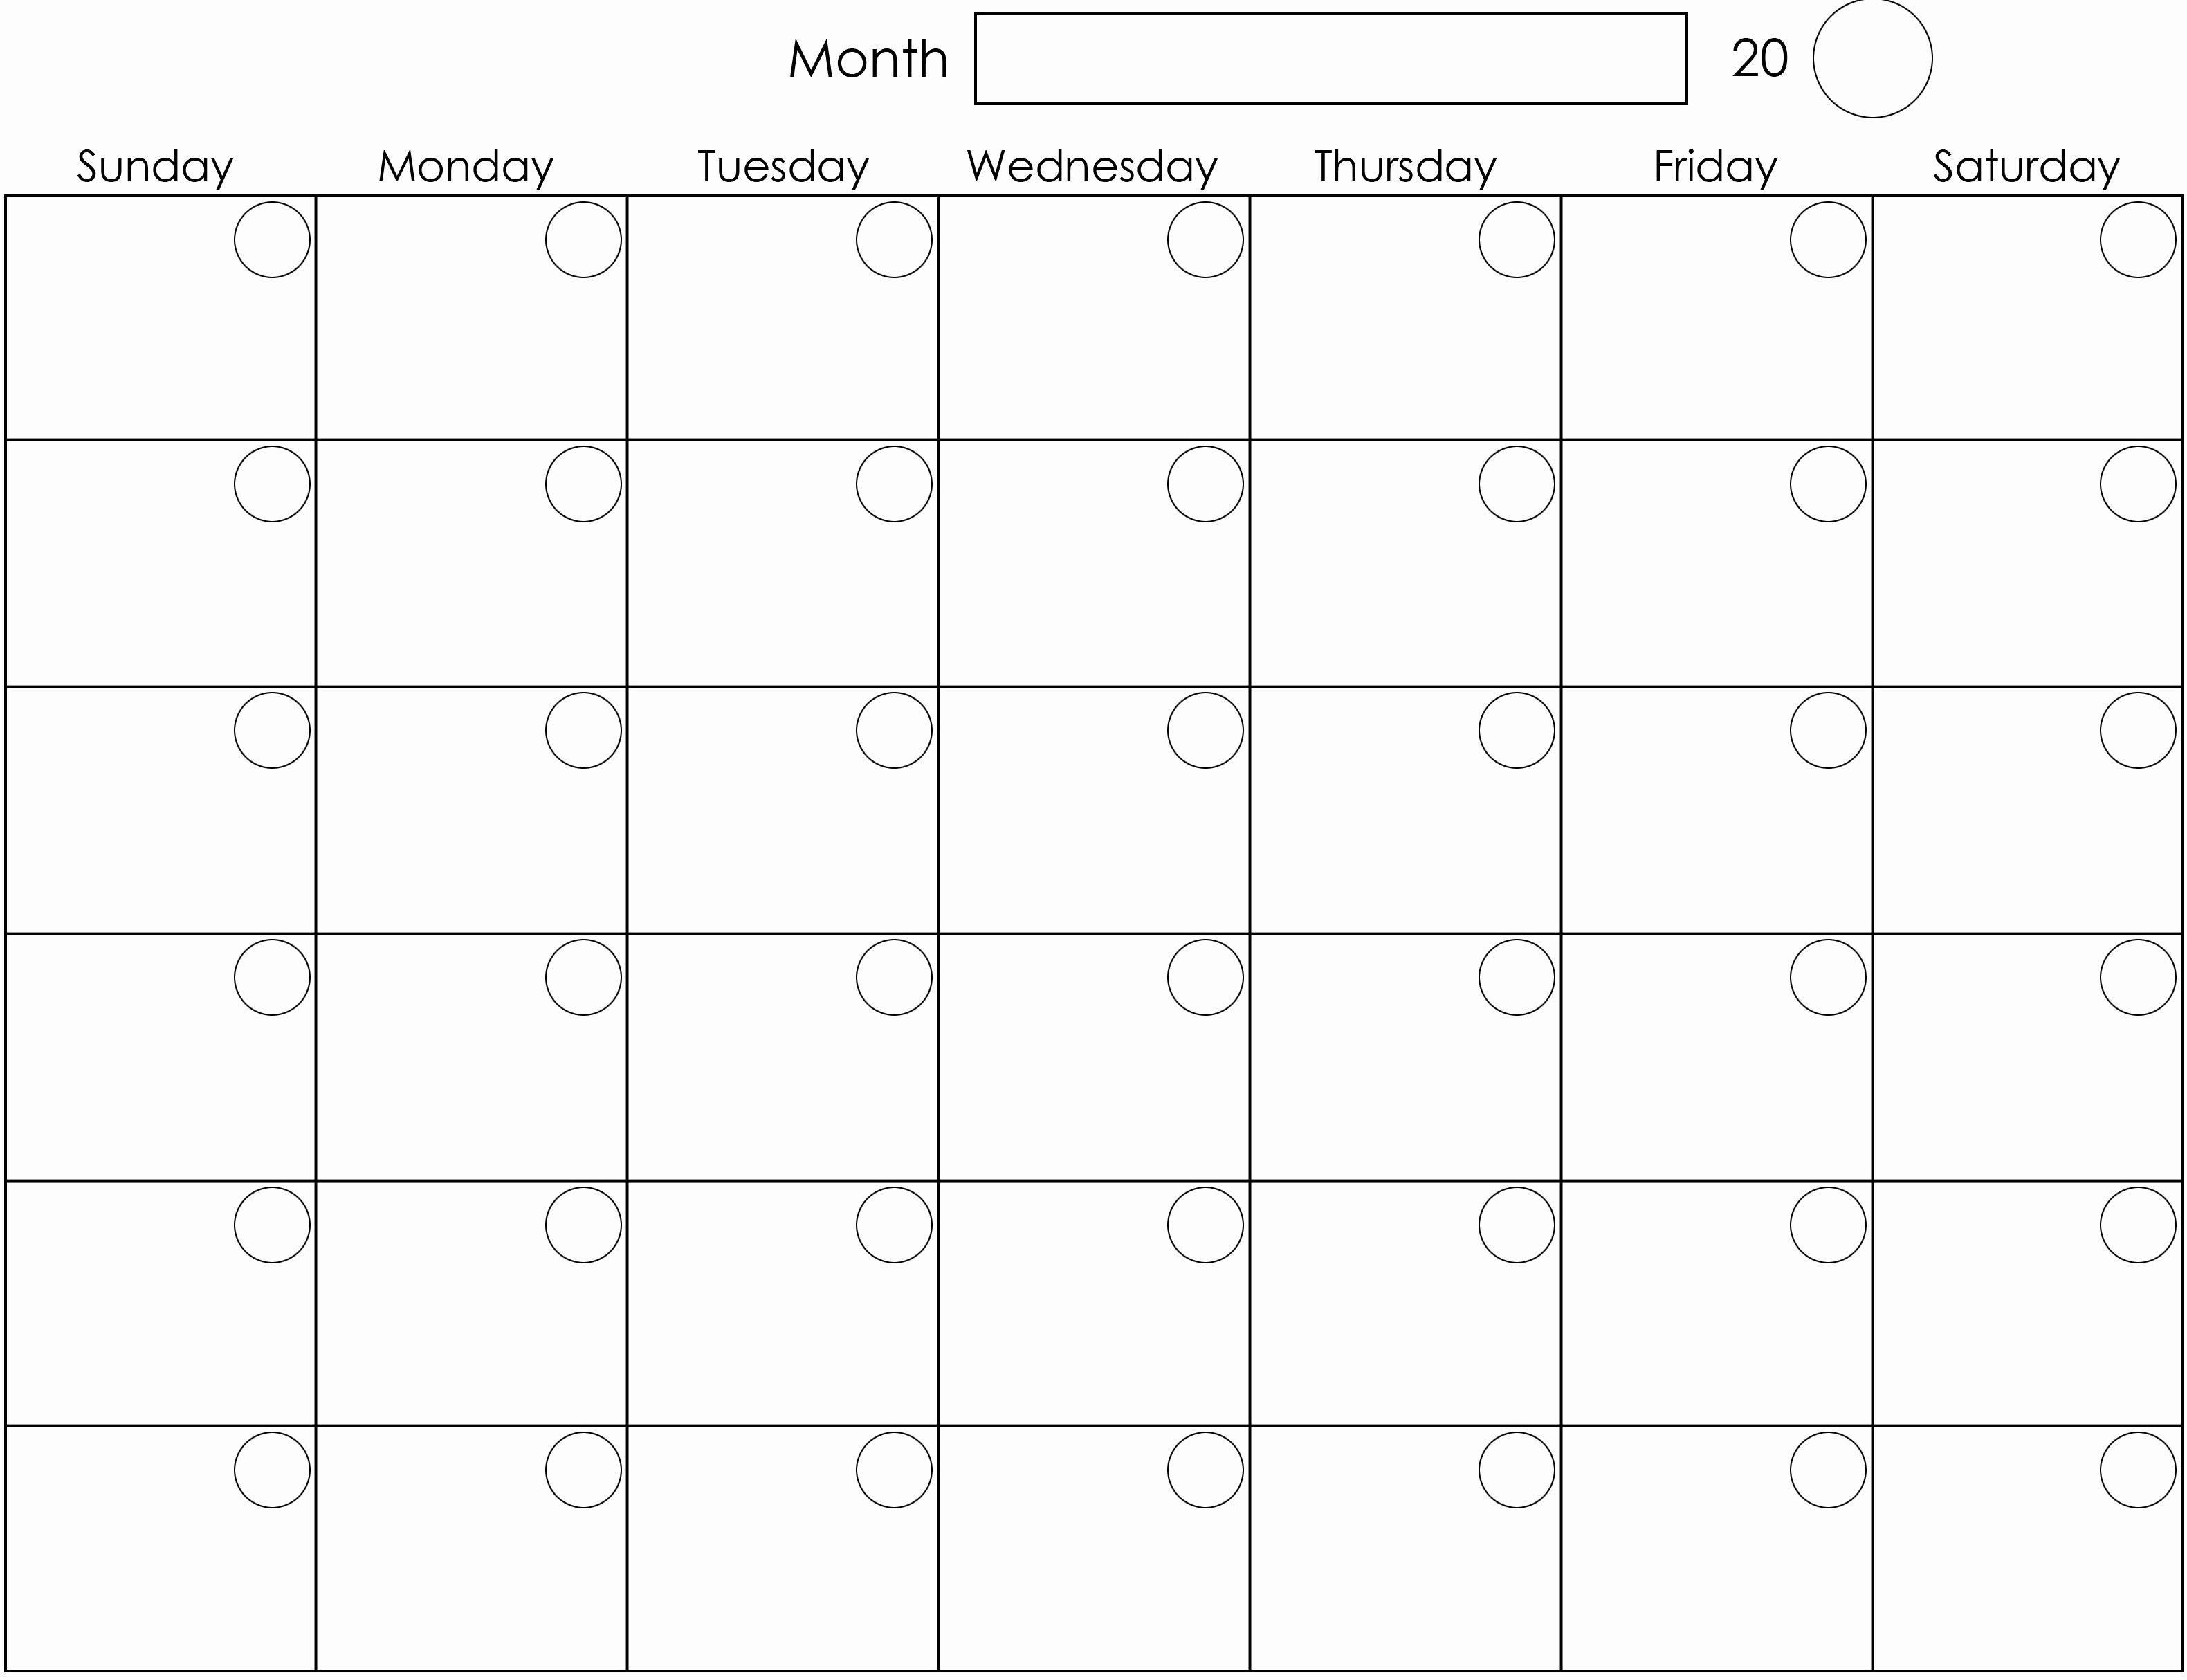 August 2018 Blank Calendar Templates